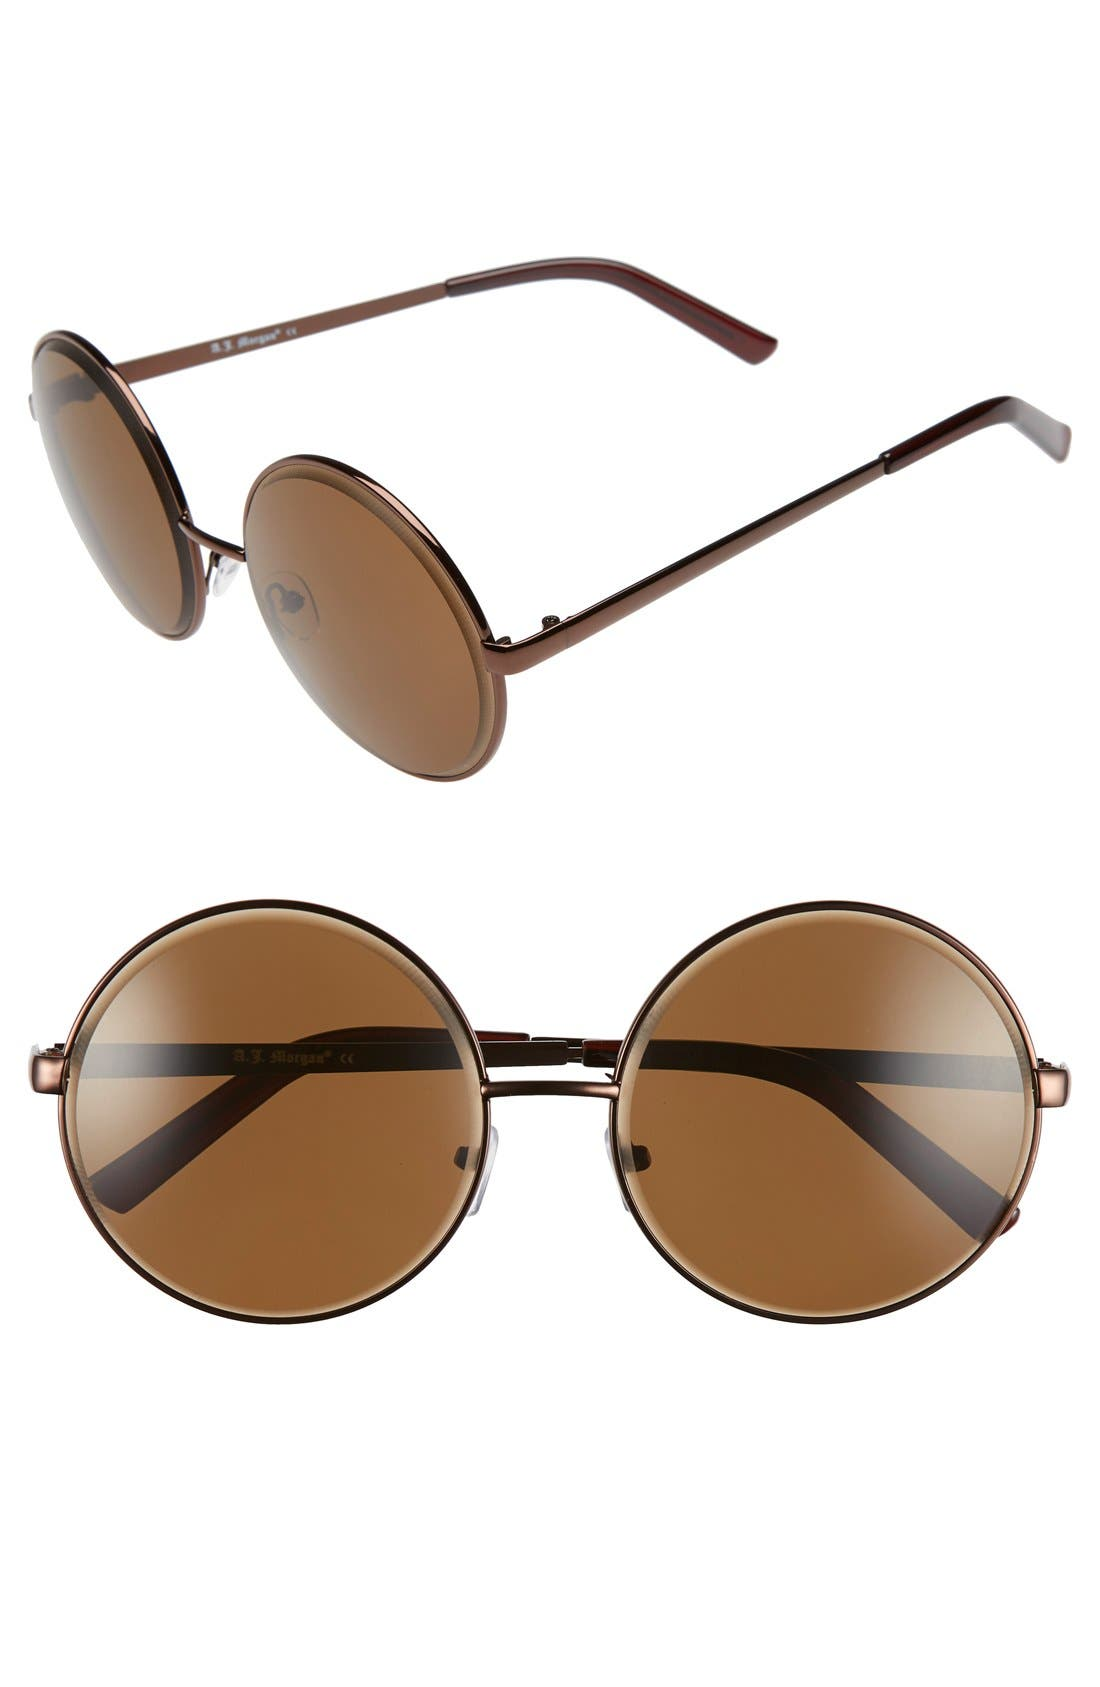 Main Image - A.J. Morgan 'Global' 60mm Oversize Round Sunglasses